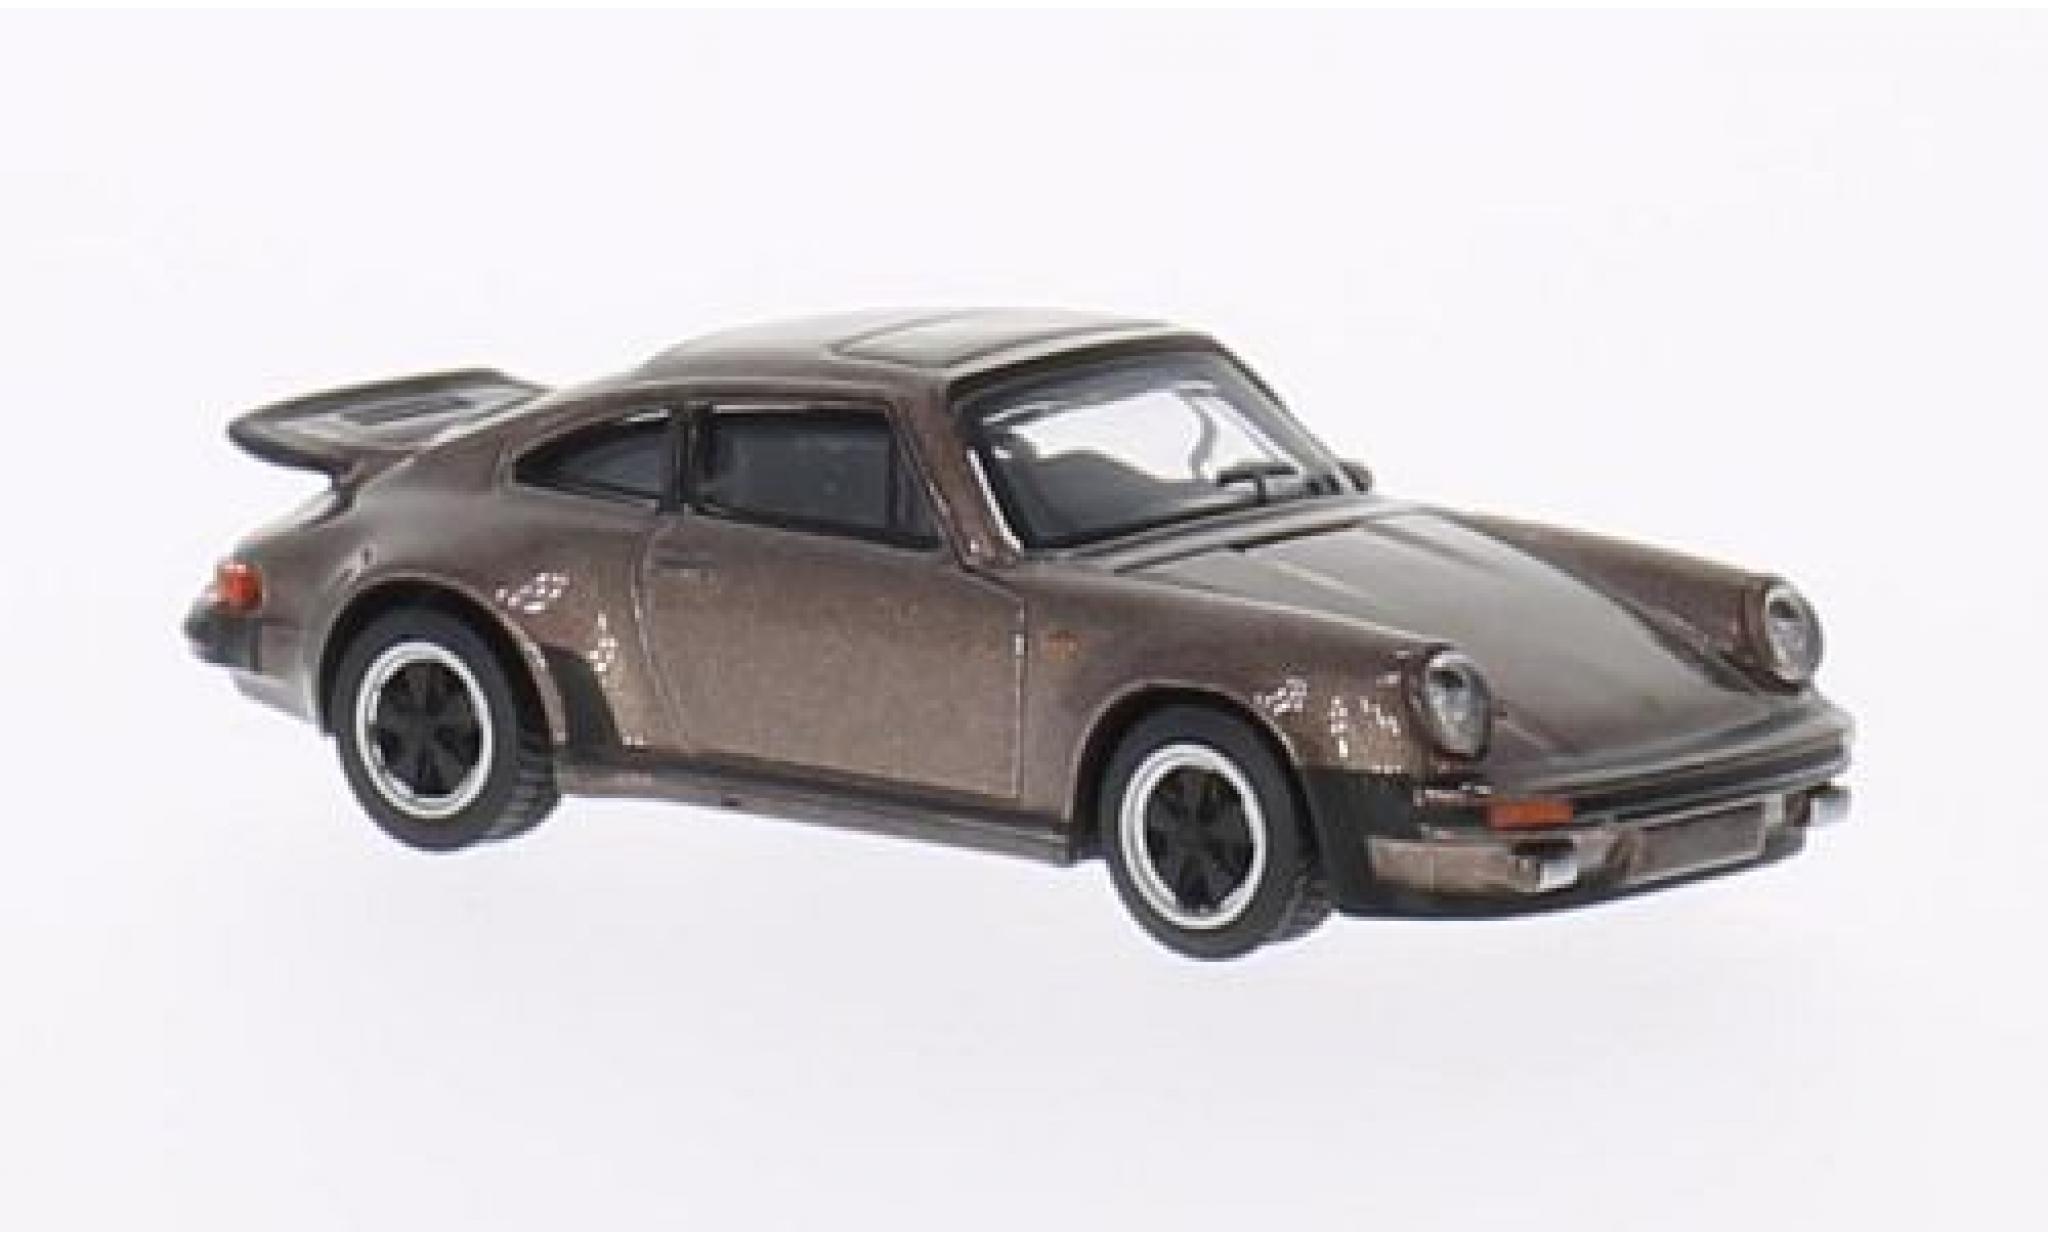 Porsche 911 1/64 Schuco Turbo 3.0 metallise brown